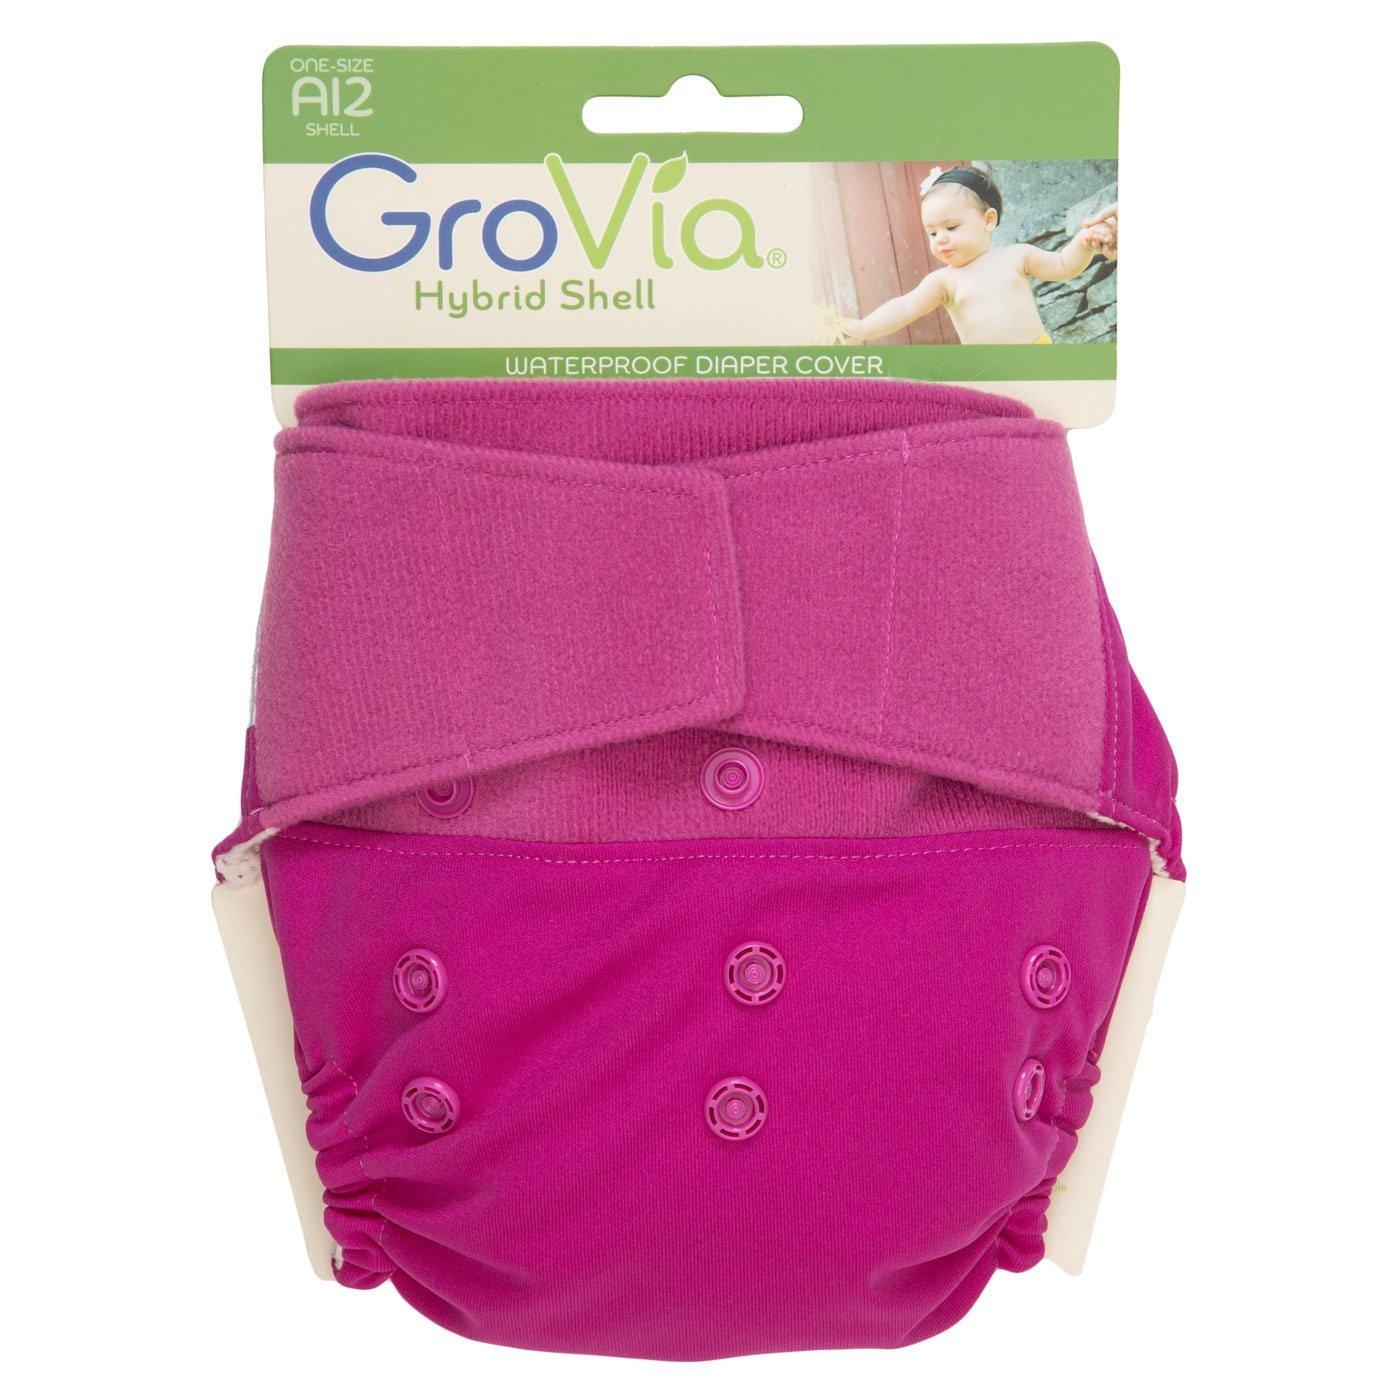 Lotus Hook and Loop GroVia Hybrid Cloth Diaper One Size